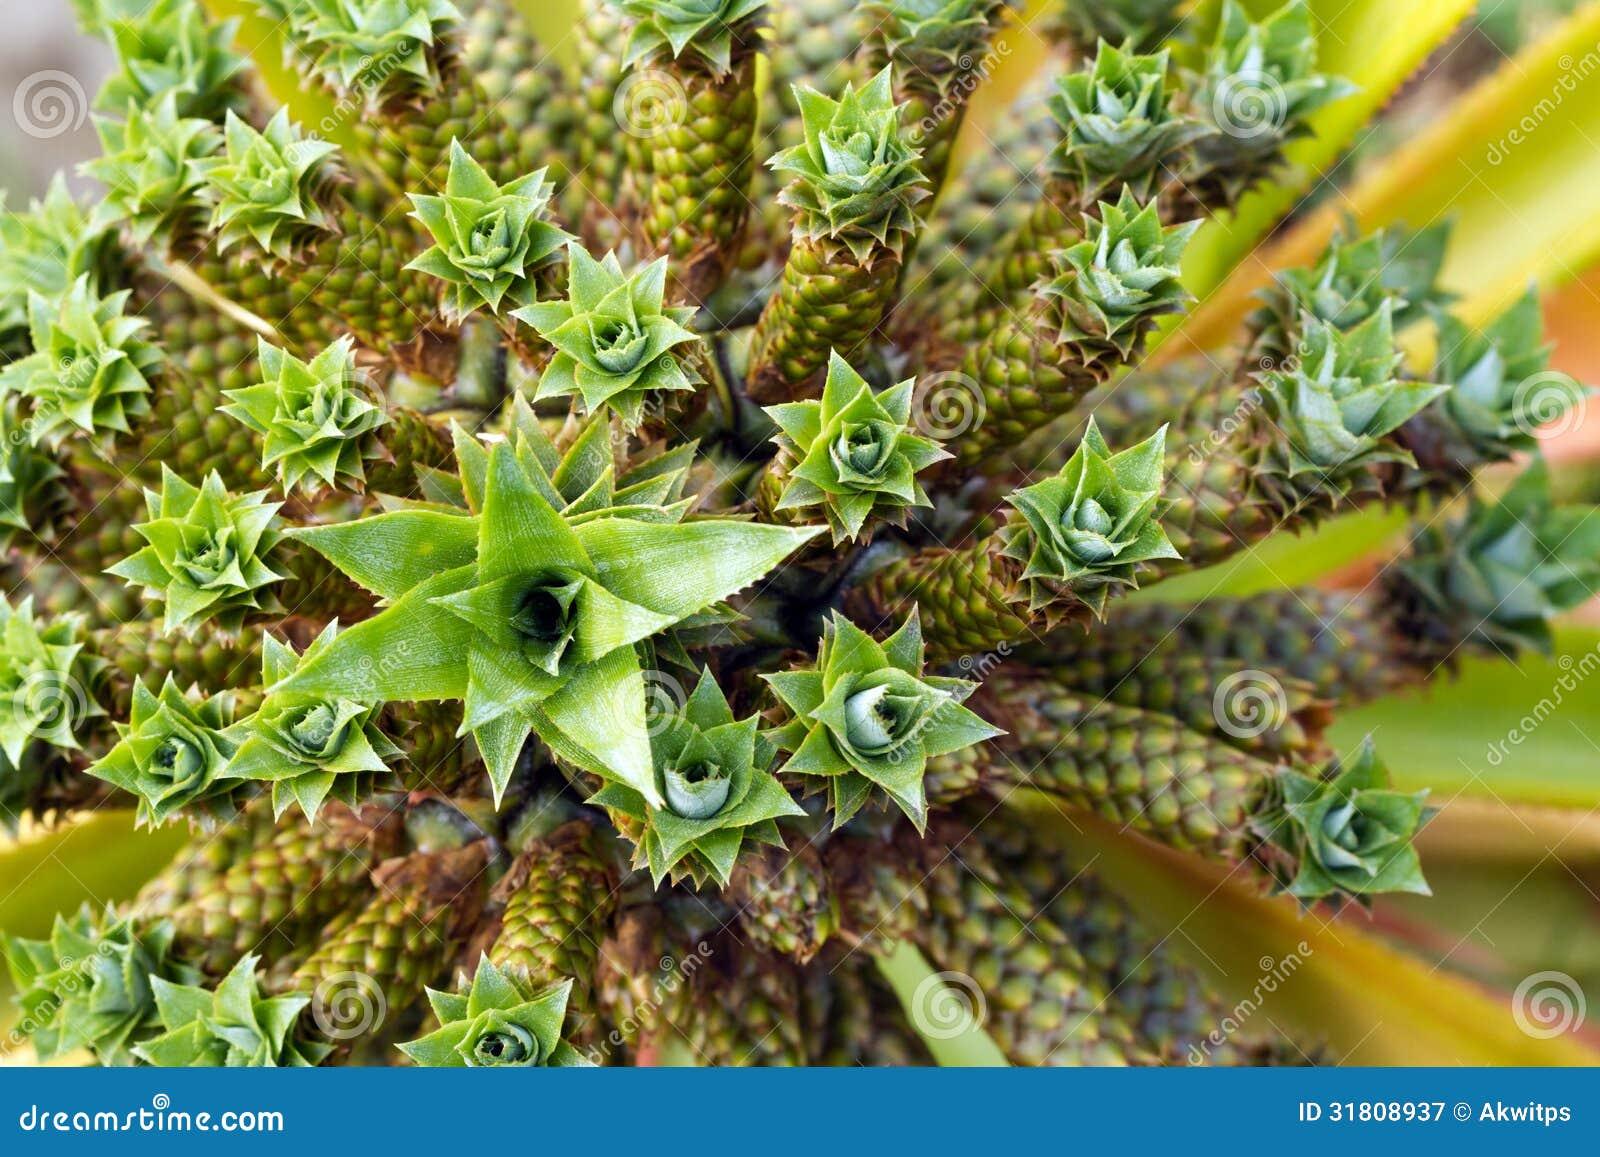 Dwarf Pineapple - Anan...